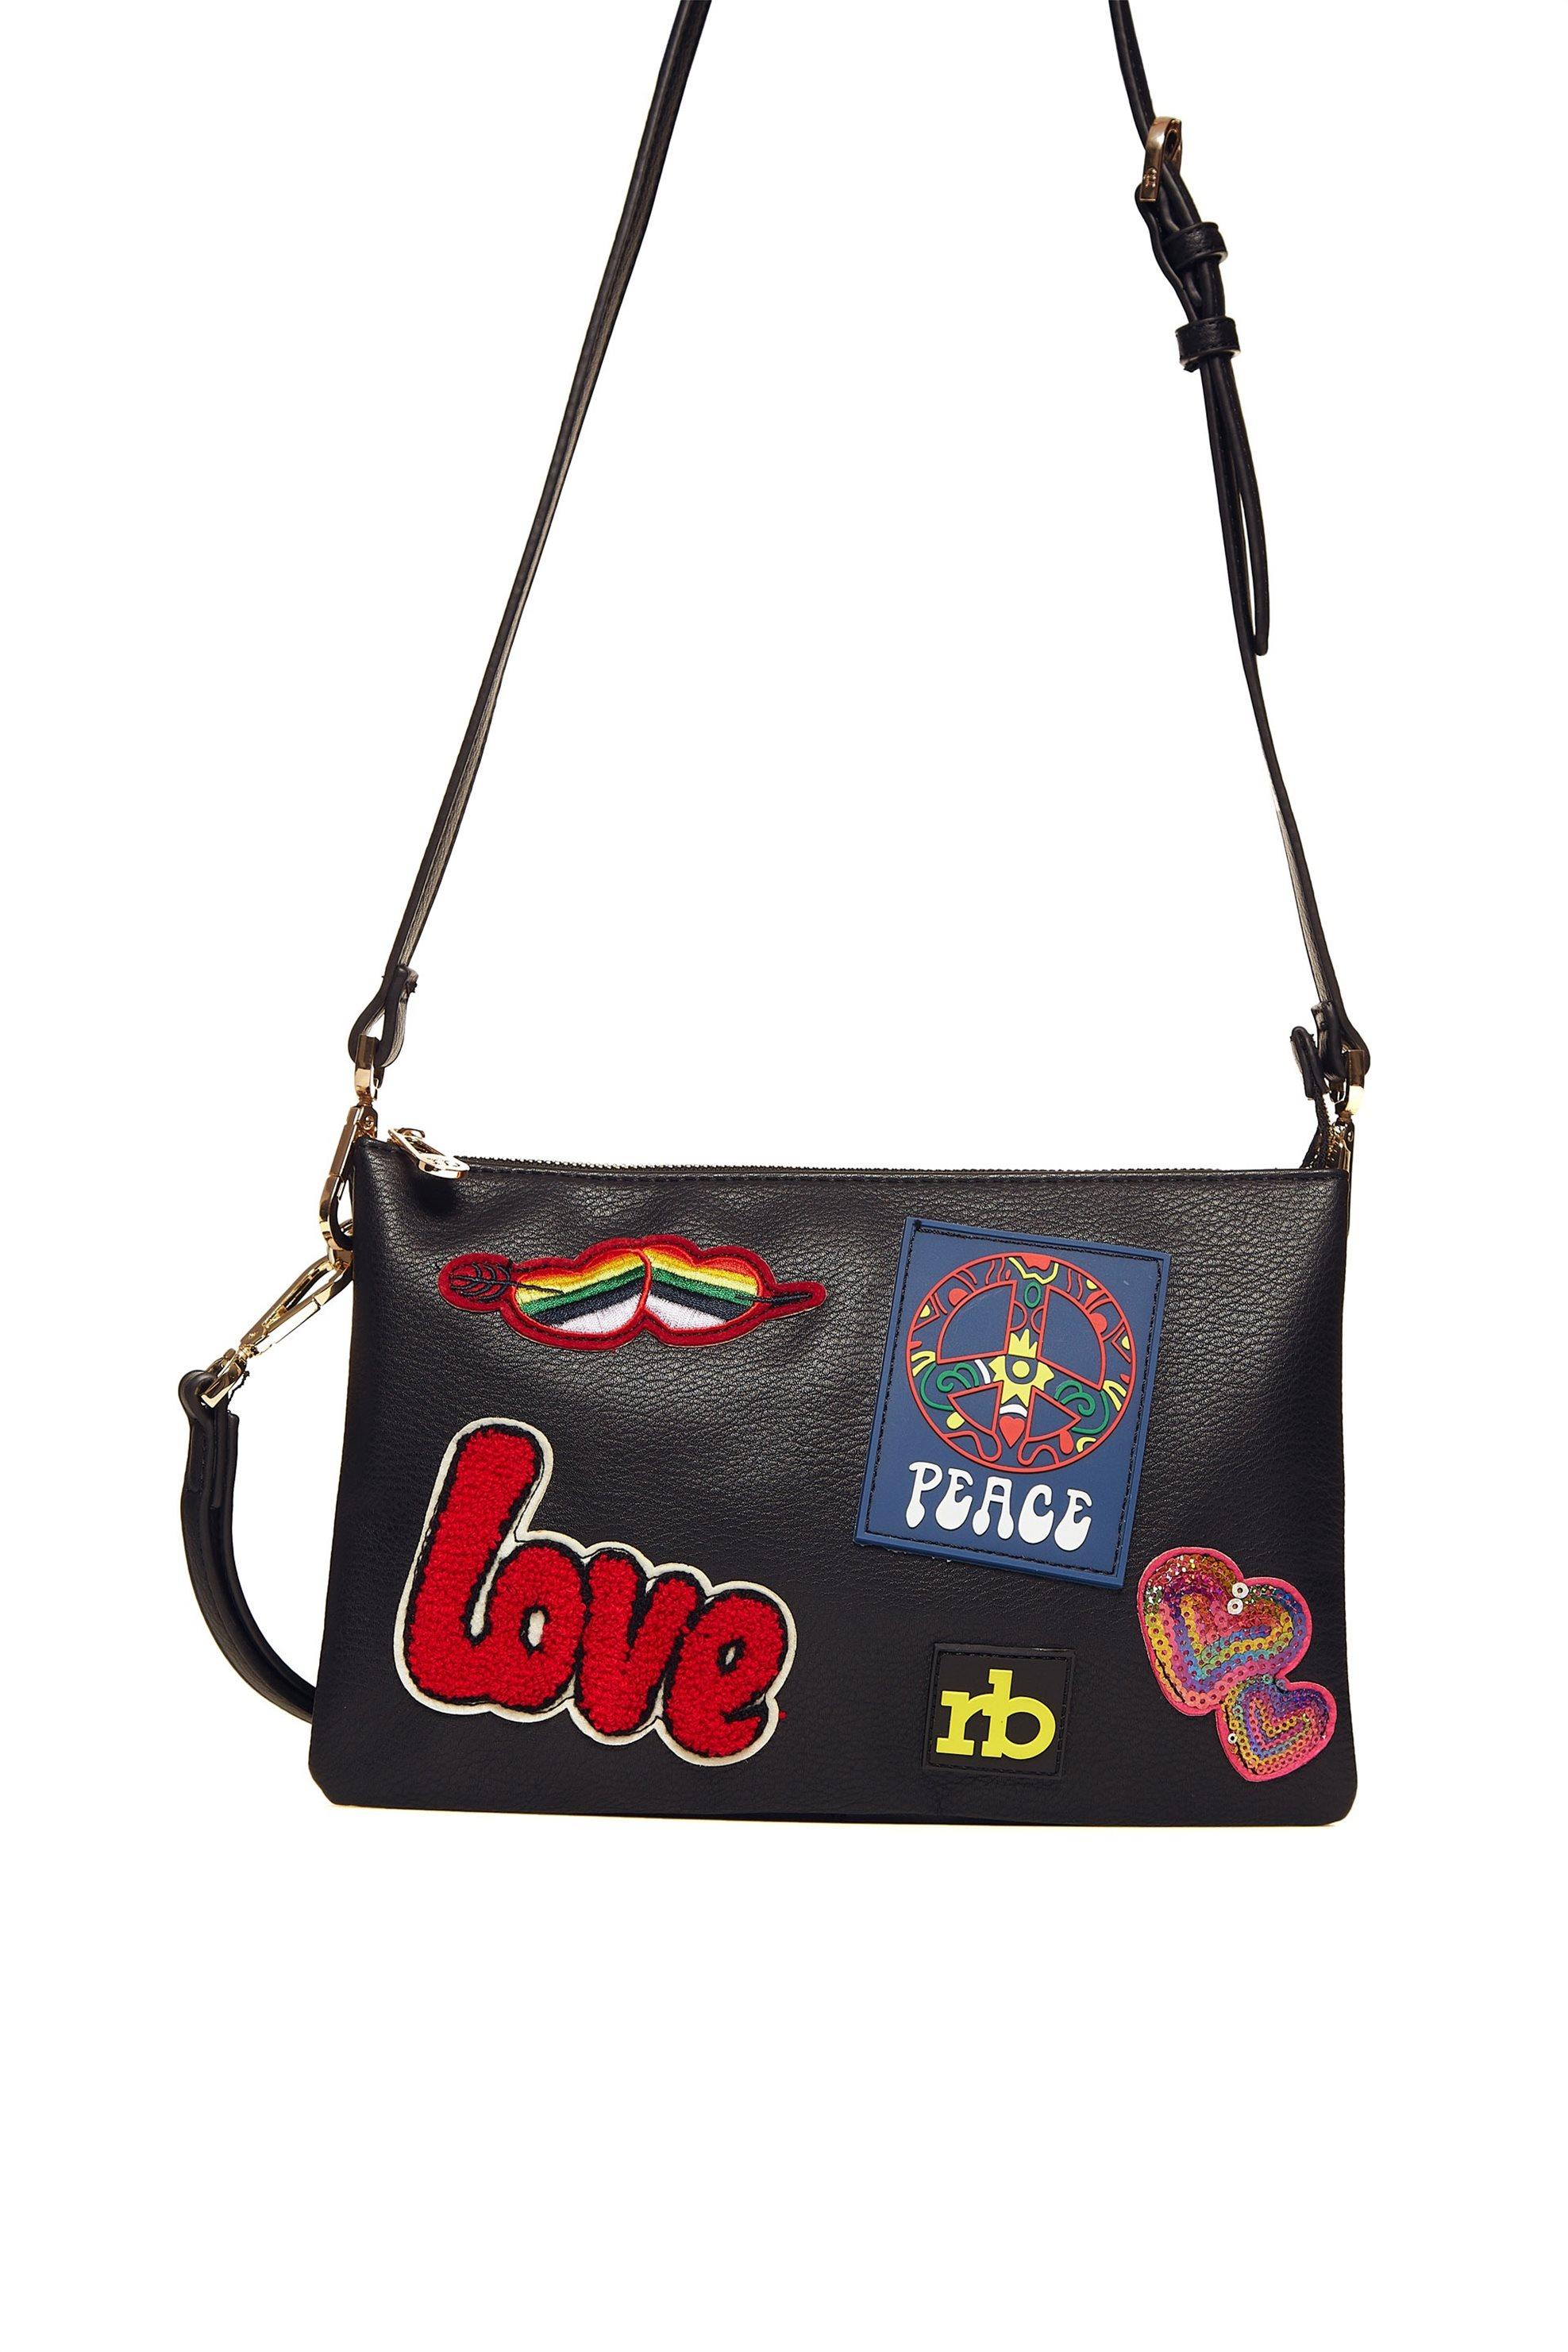 db521a9e0d Roccobarocco γυναικεία τσάντα crossbody με patches - 01GRBBS1O203 JA - Μαύρο